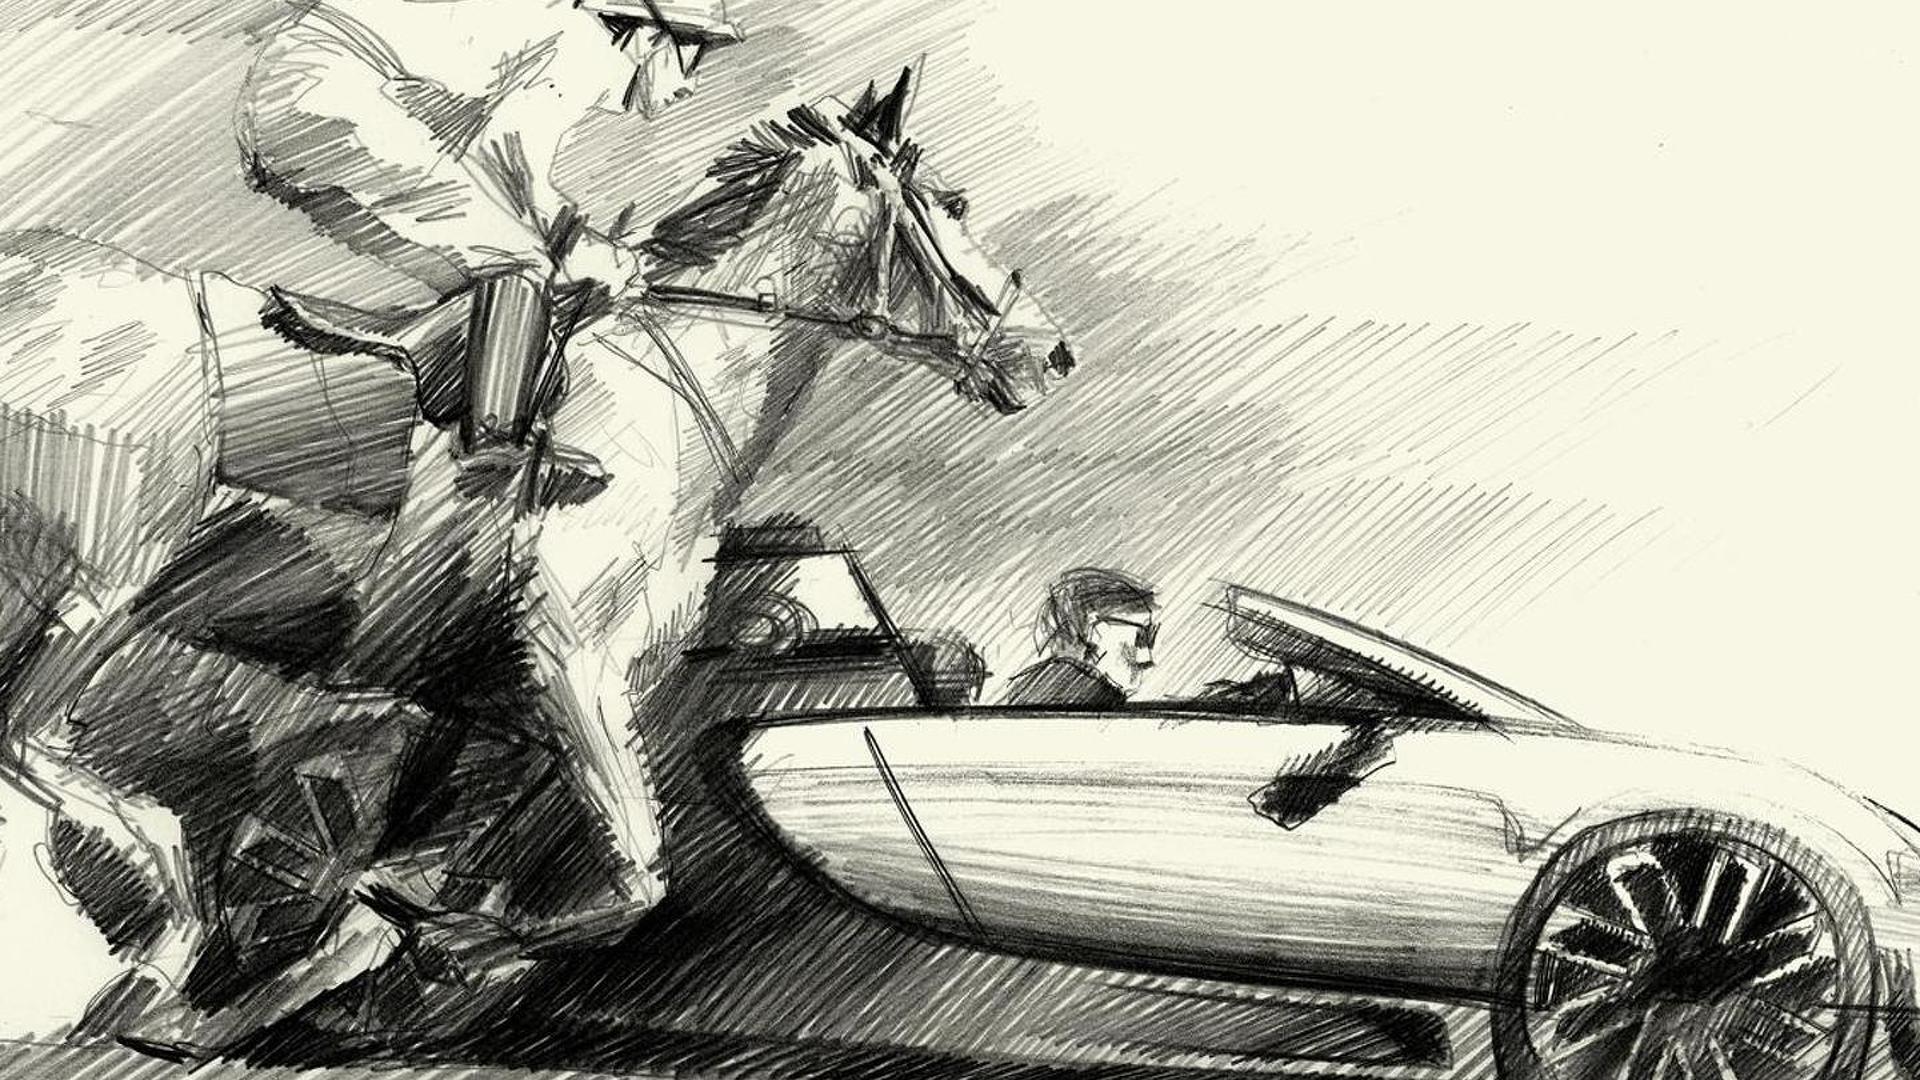 Bugatti Veyron Ettore Bugatti Edition против лошади